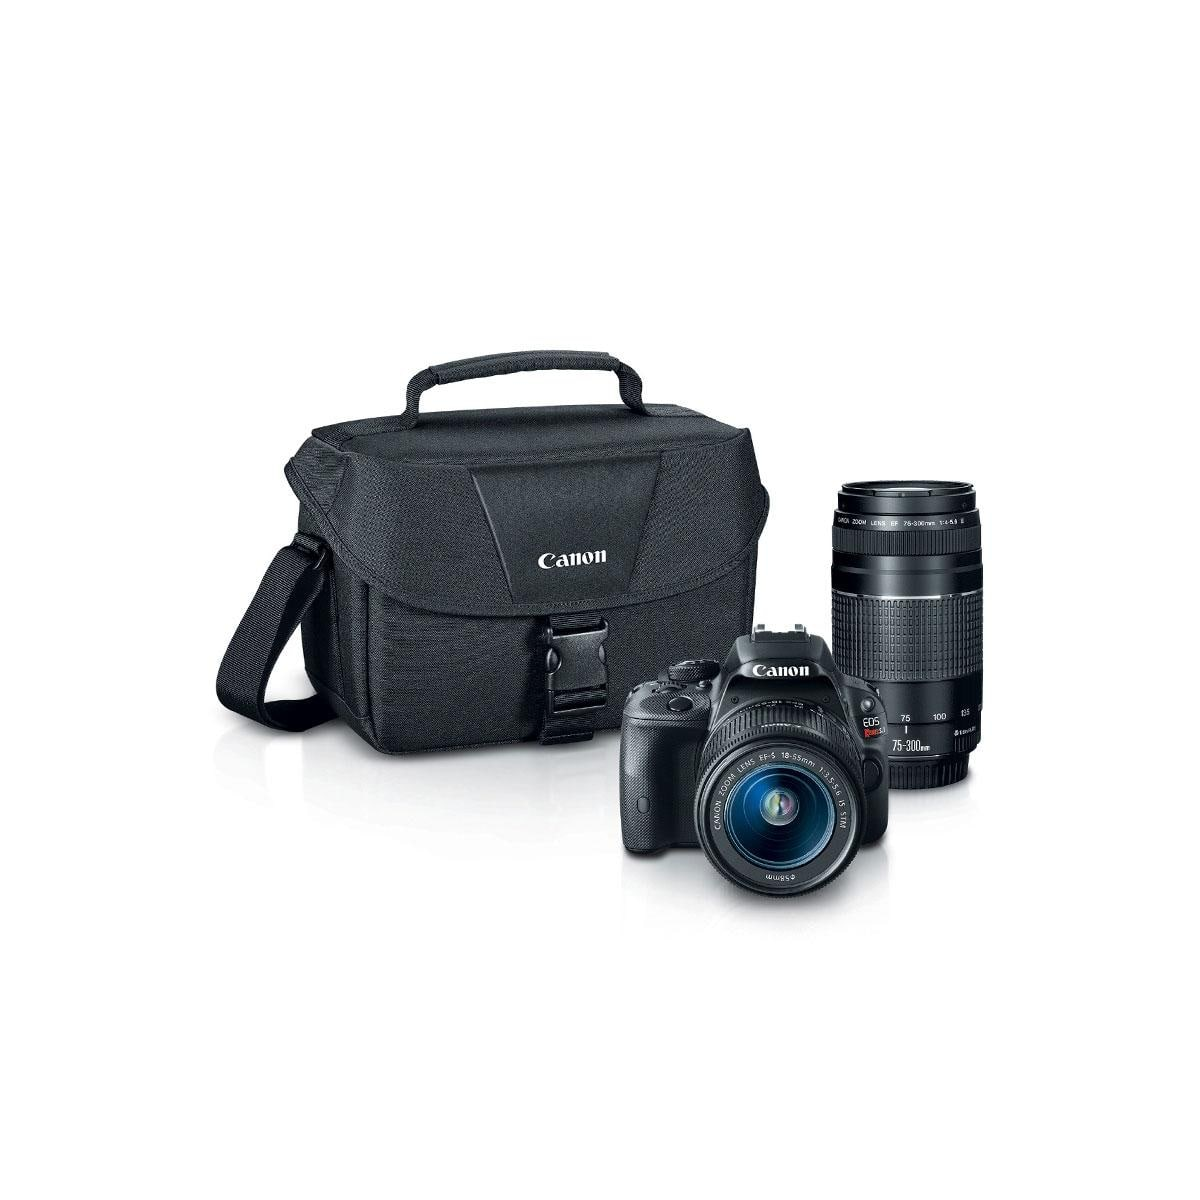 Canon SL1 DSLR w/ 18-55mm & 75-300mm Lenses + Pro-100 Printer  $400 after $350 Rebate + Free S&H